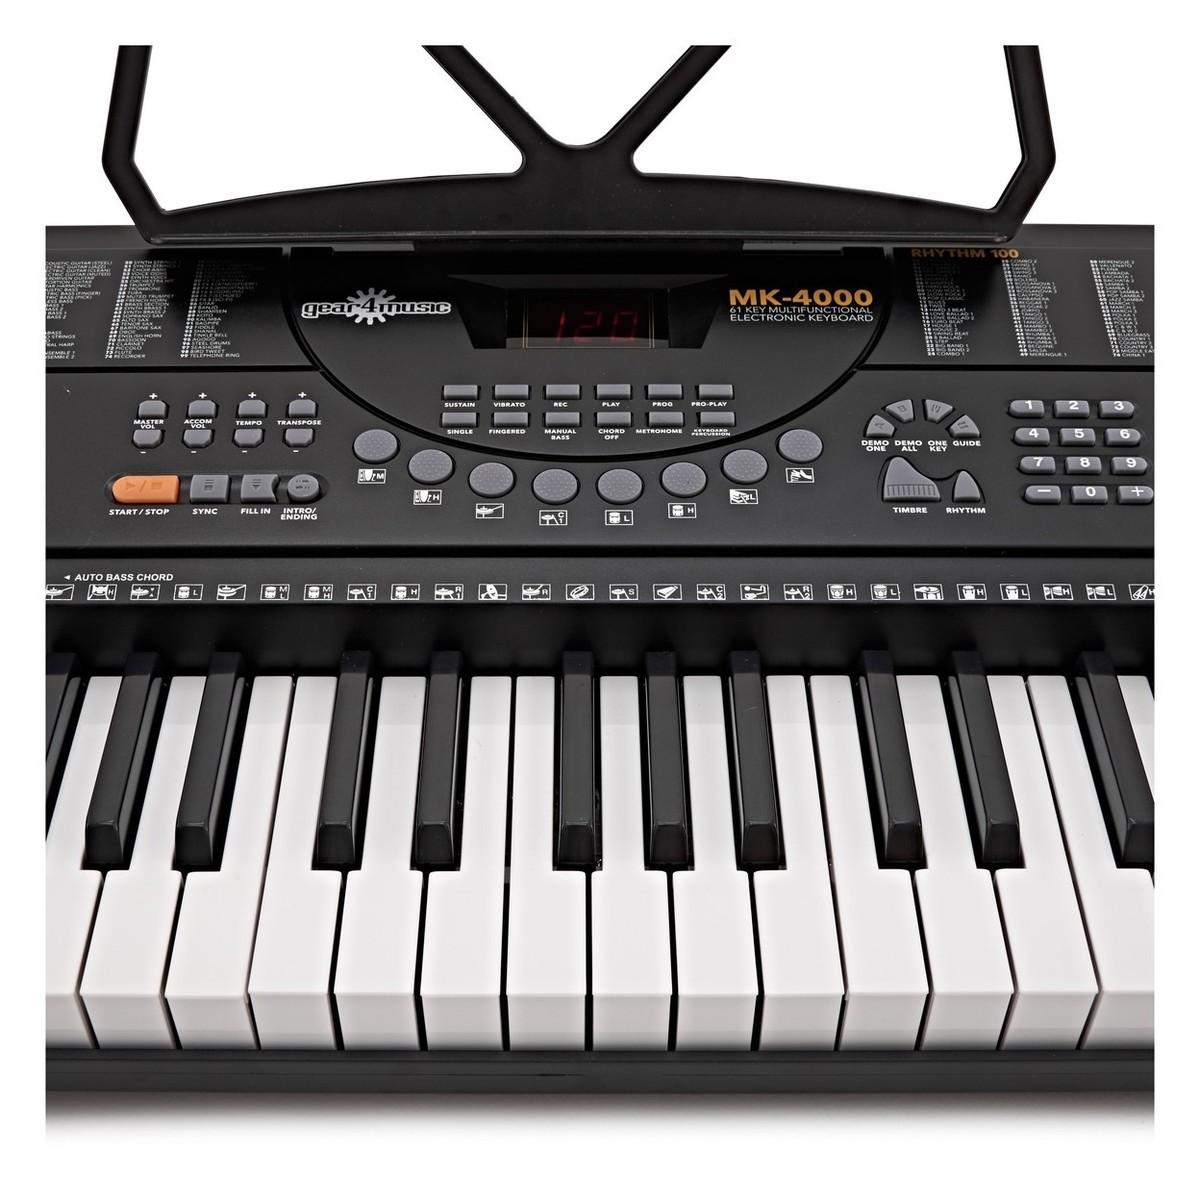 mk 4000 61 key keyboard by gear4music b stock at gear4music. Black Bedroom Furniture Sets. Home Design Ideas